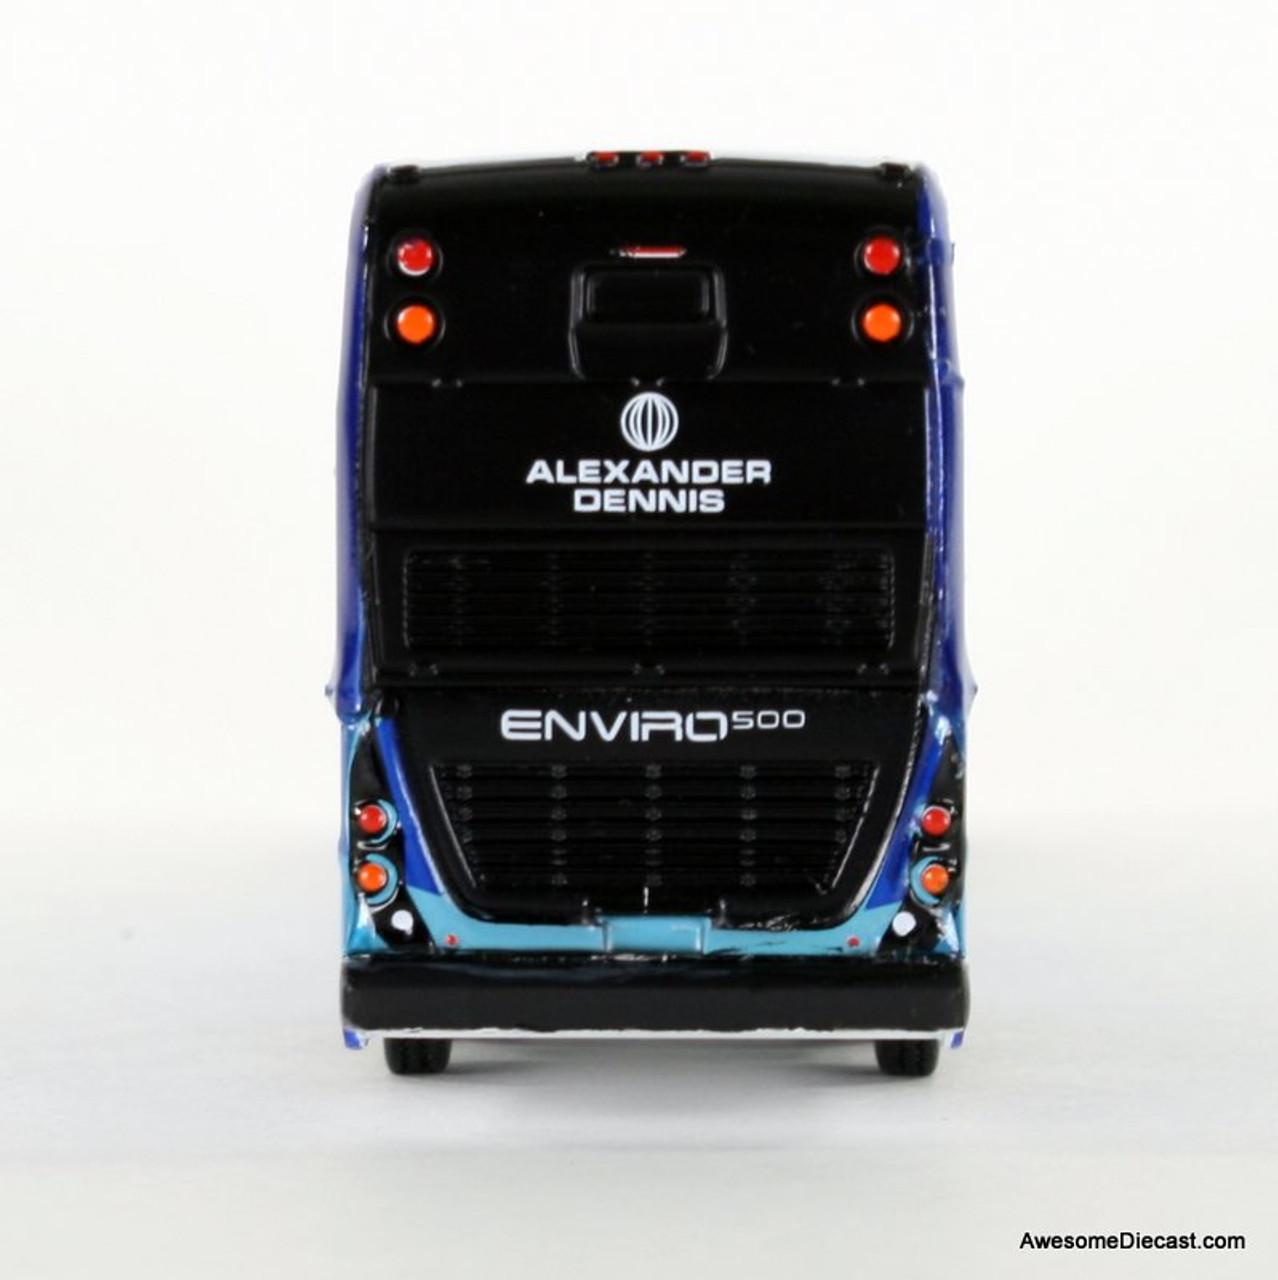 Iconic Replica 1:87 Alexander Dennis Enviro 500 Double Decker Bus: Corporate Rear 87-0085